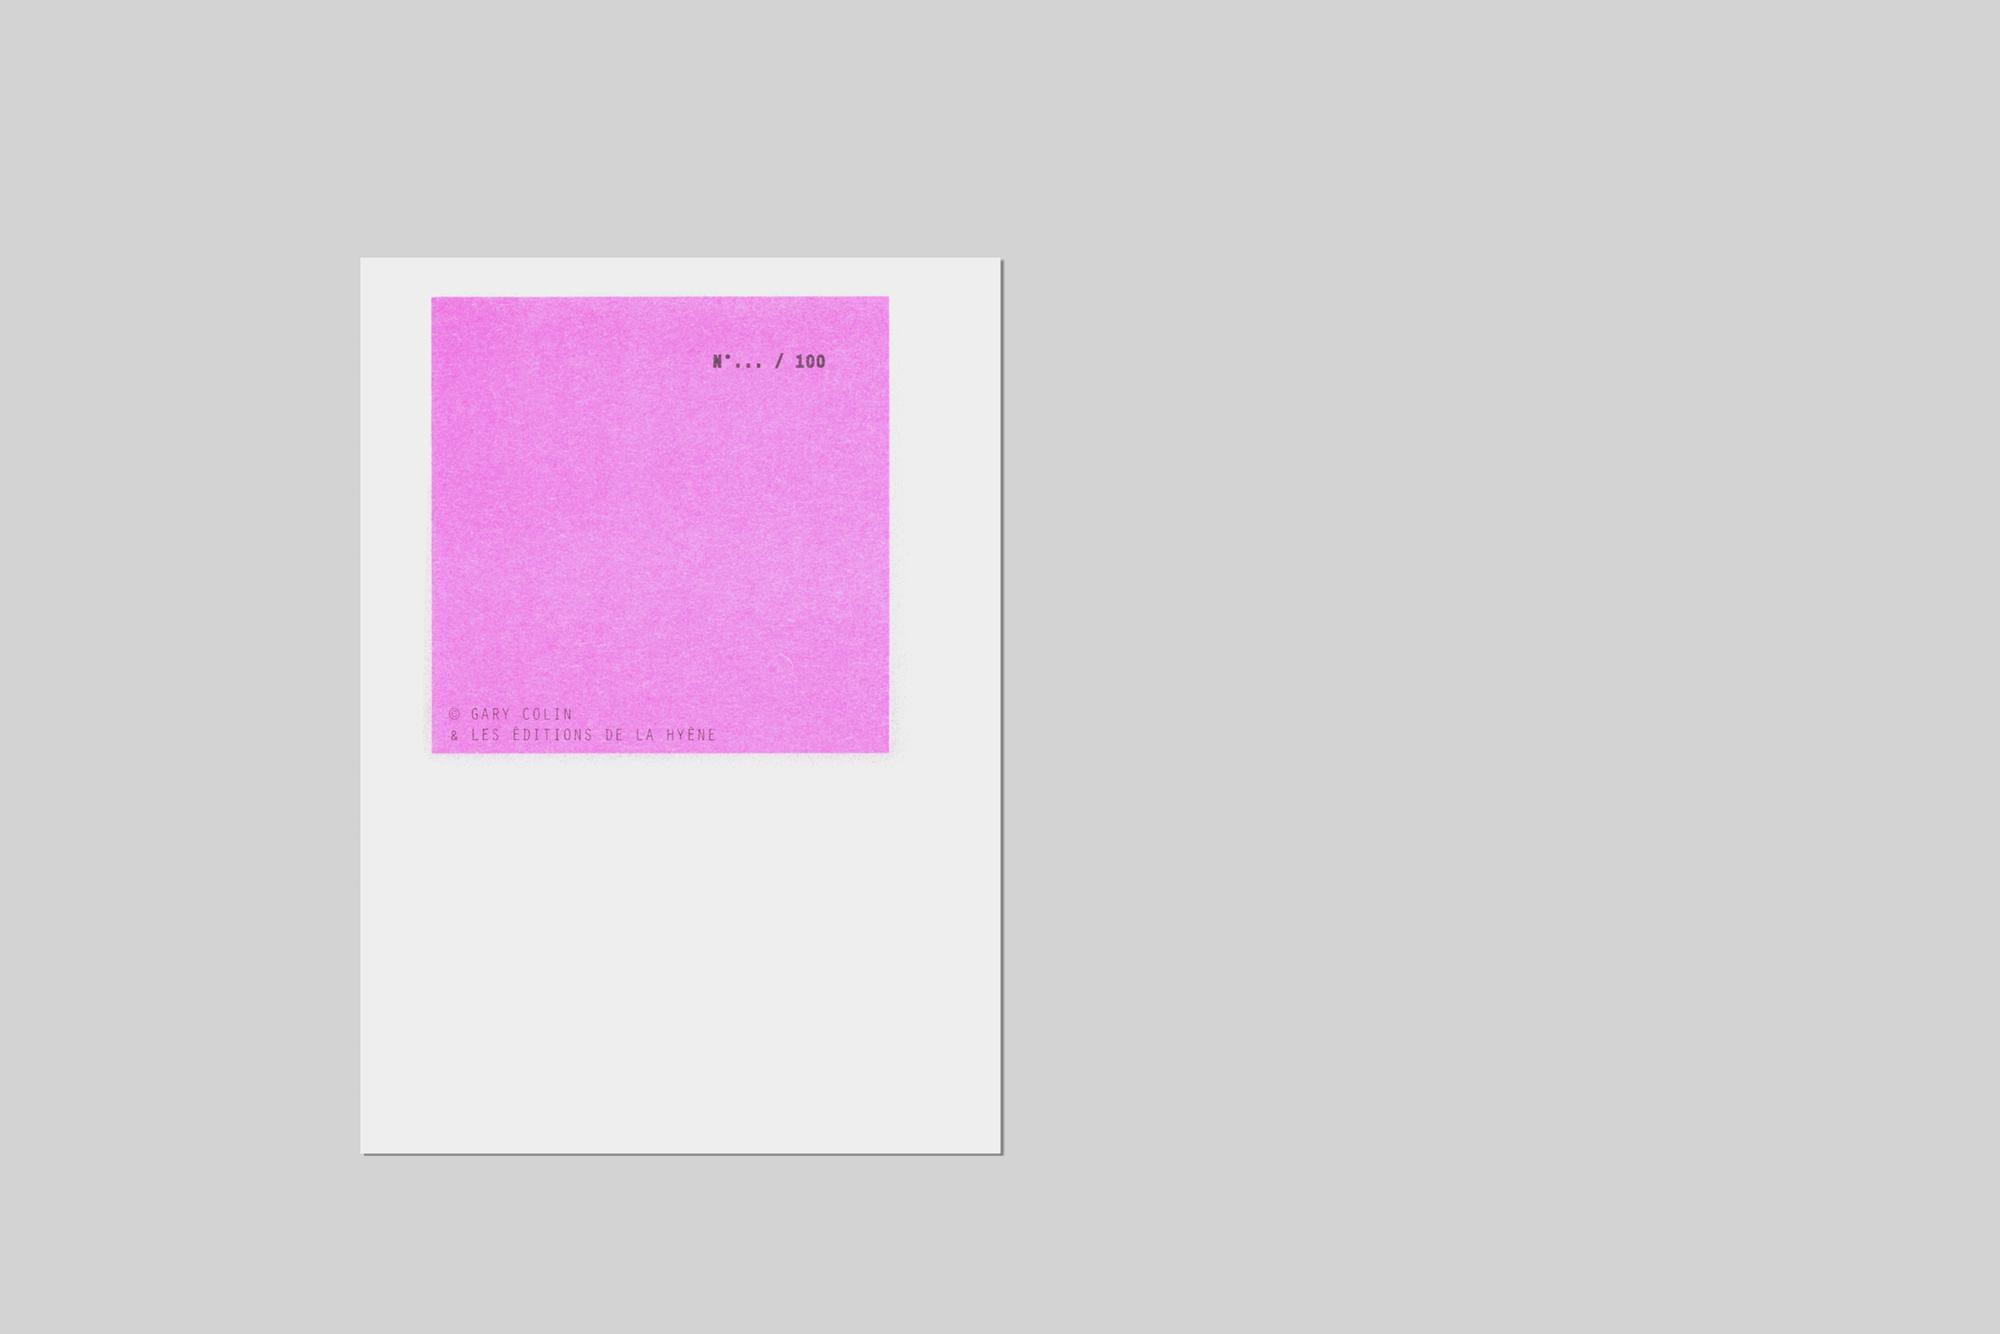 annuaire telephone risograph zine A6 book